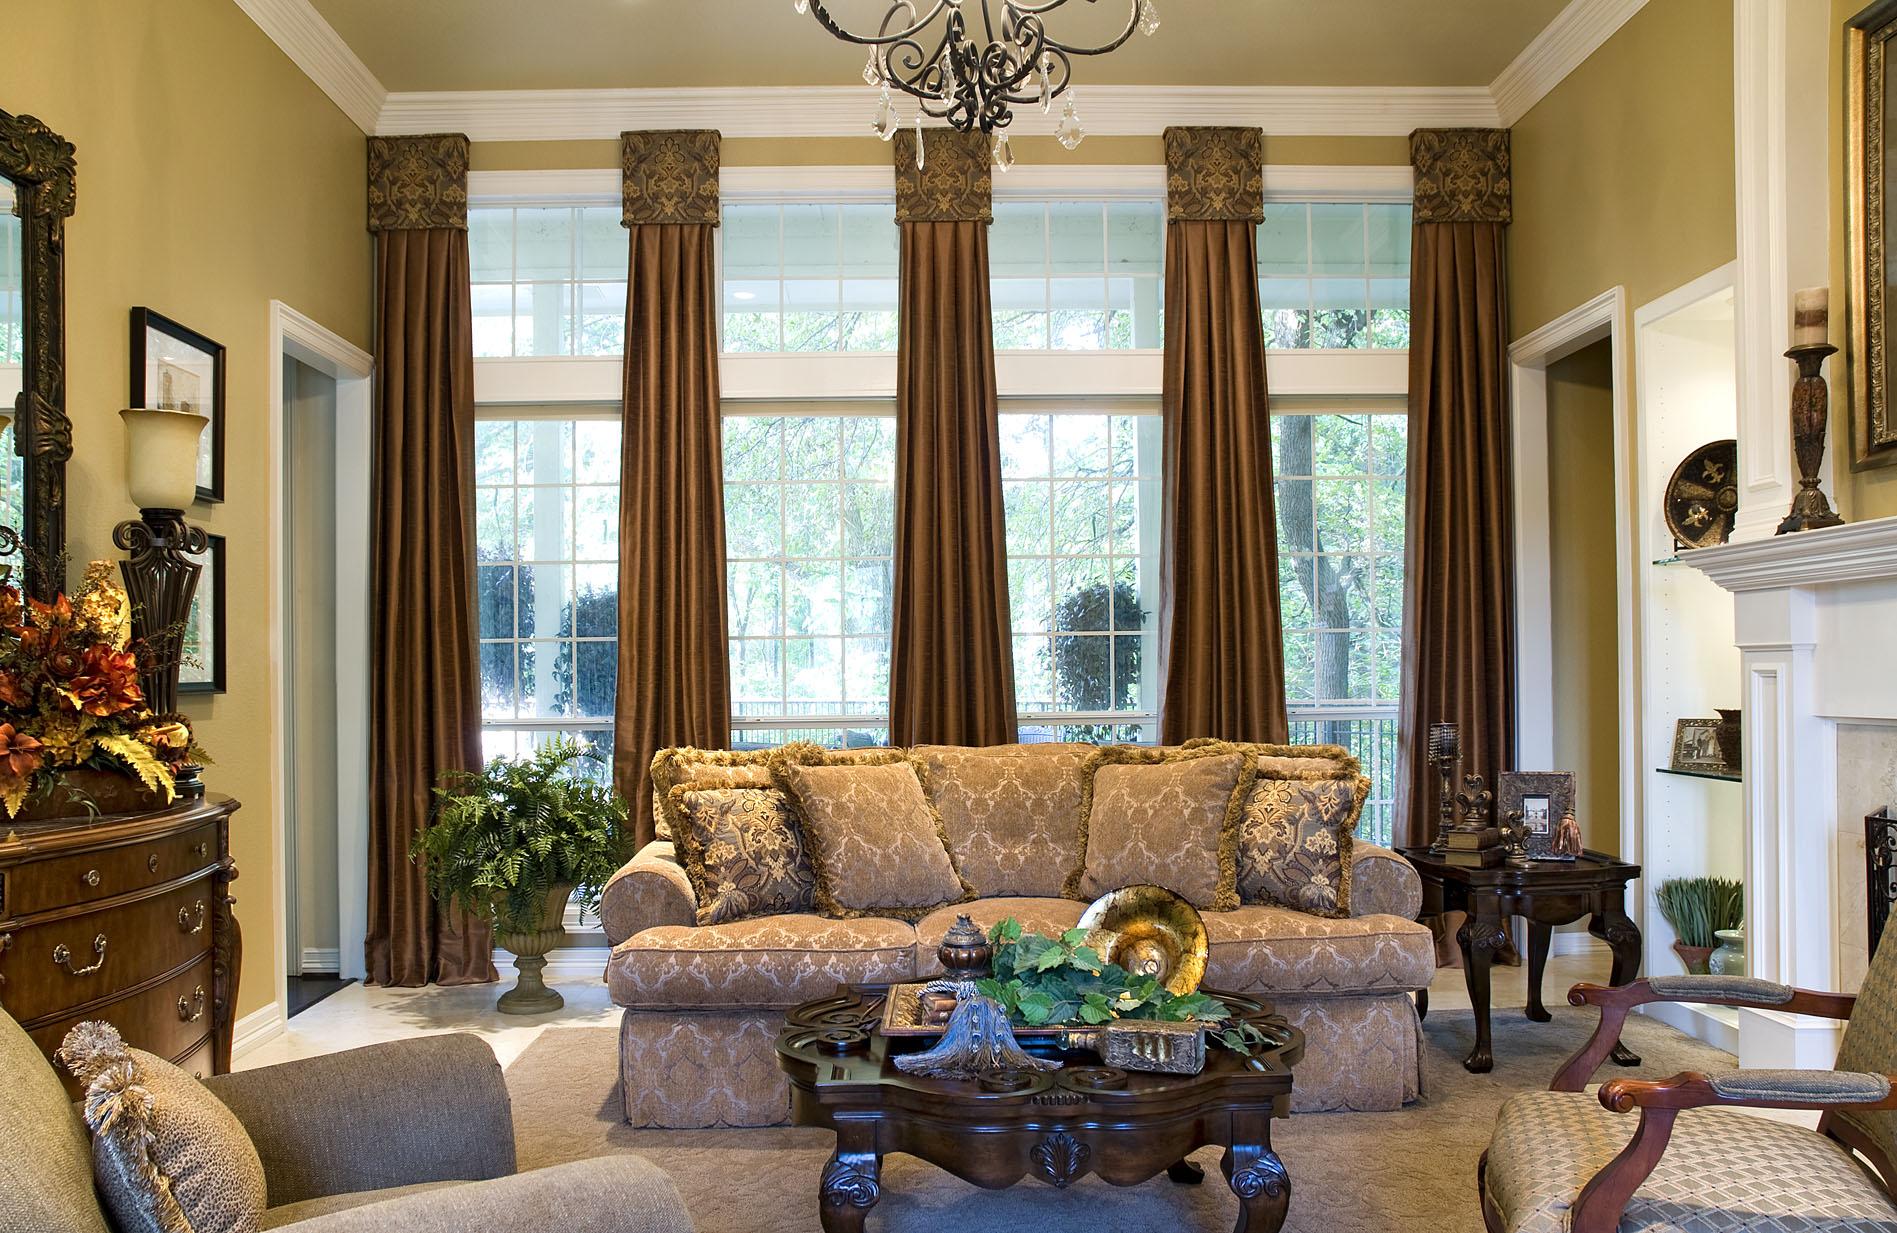 Decorating Den Interiors® Blog - Interior Decorating and Design Tips ...